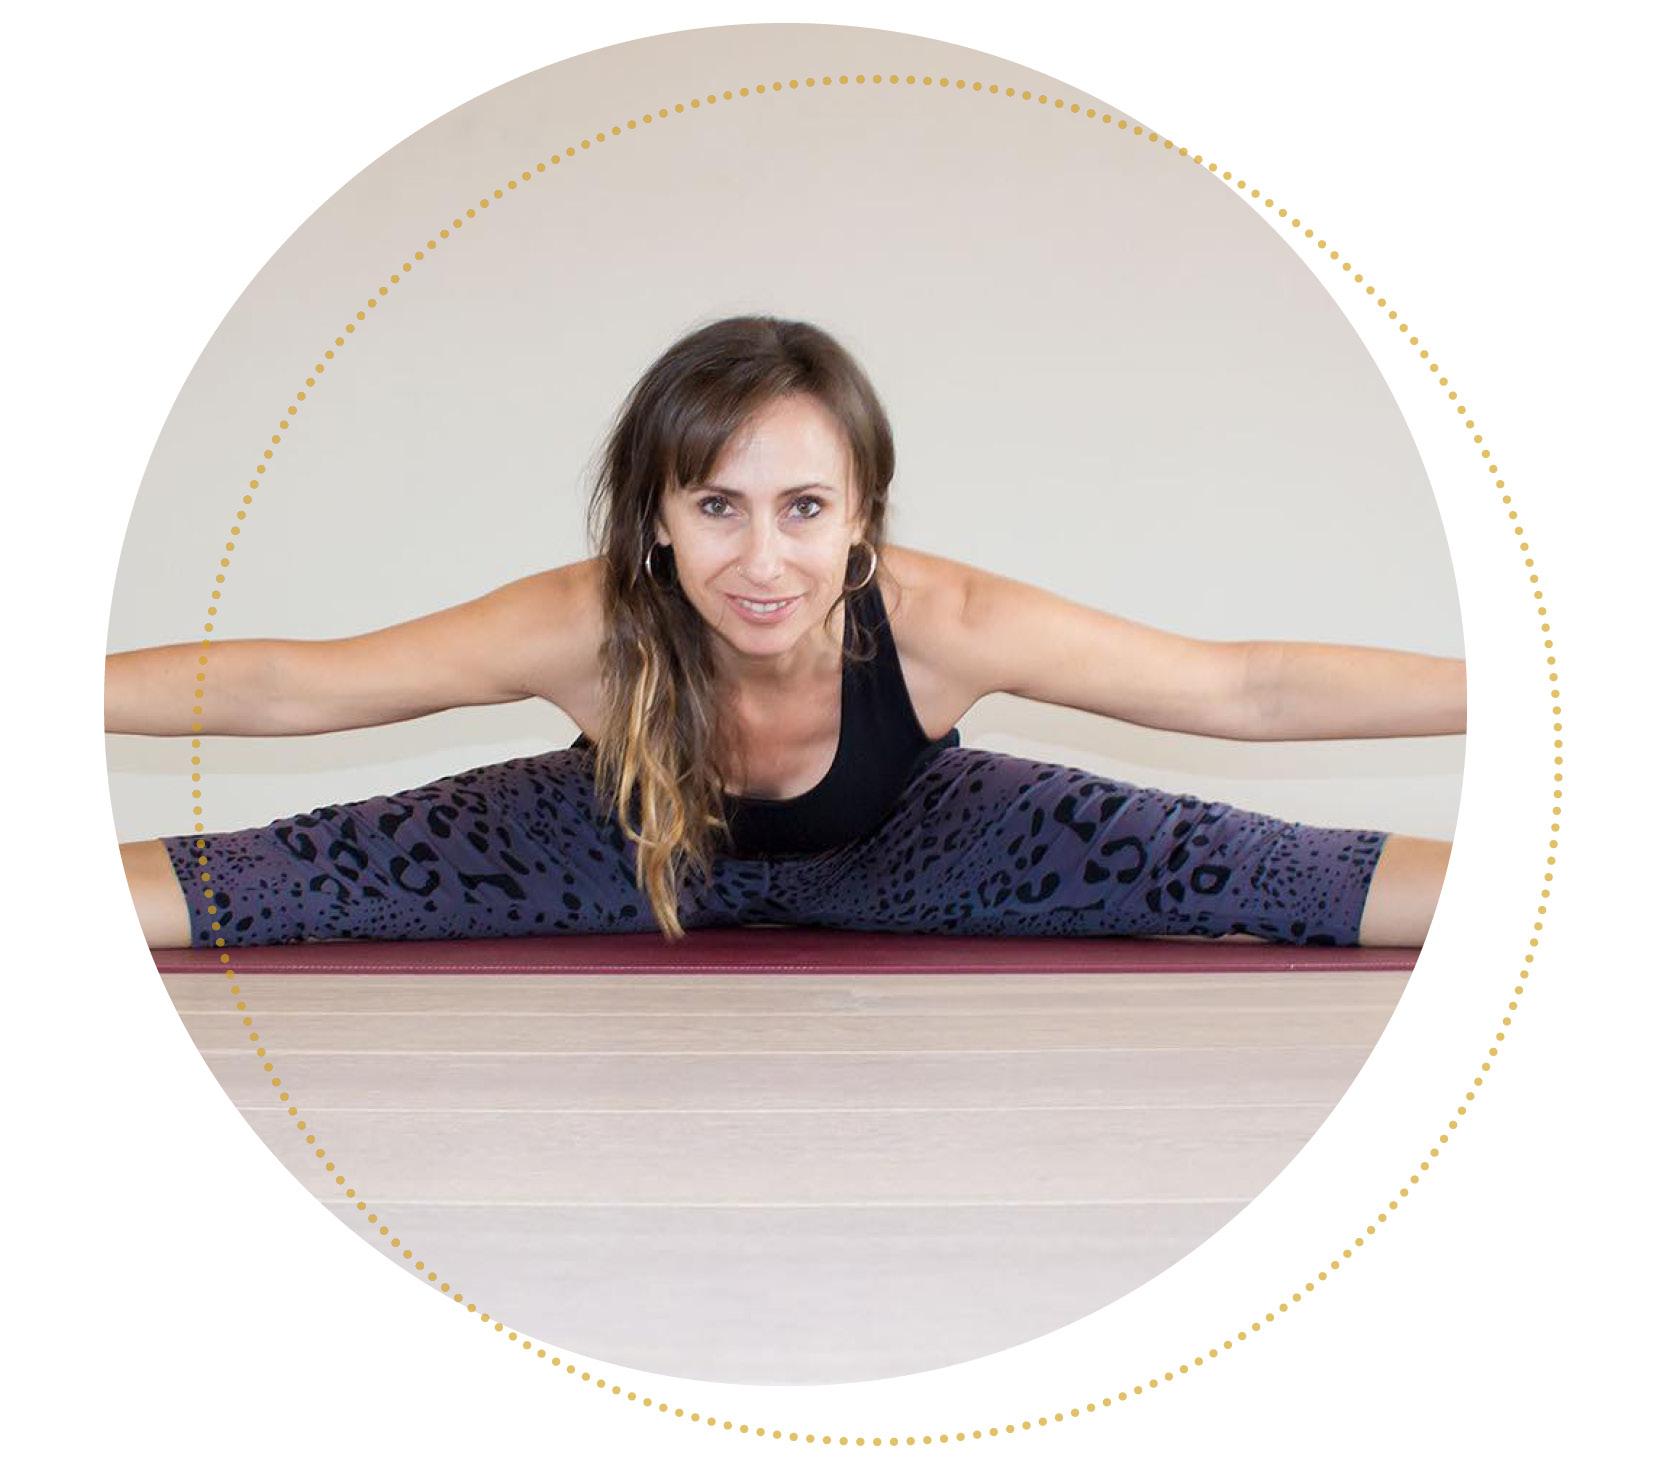 ck_Teresa Summer / The Power of Yoga